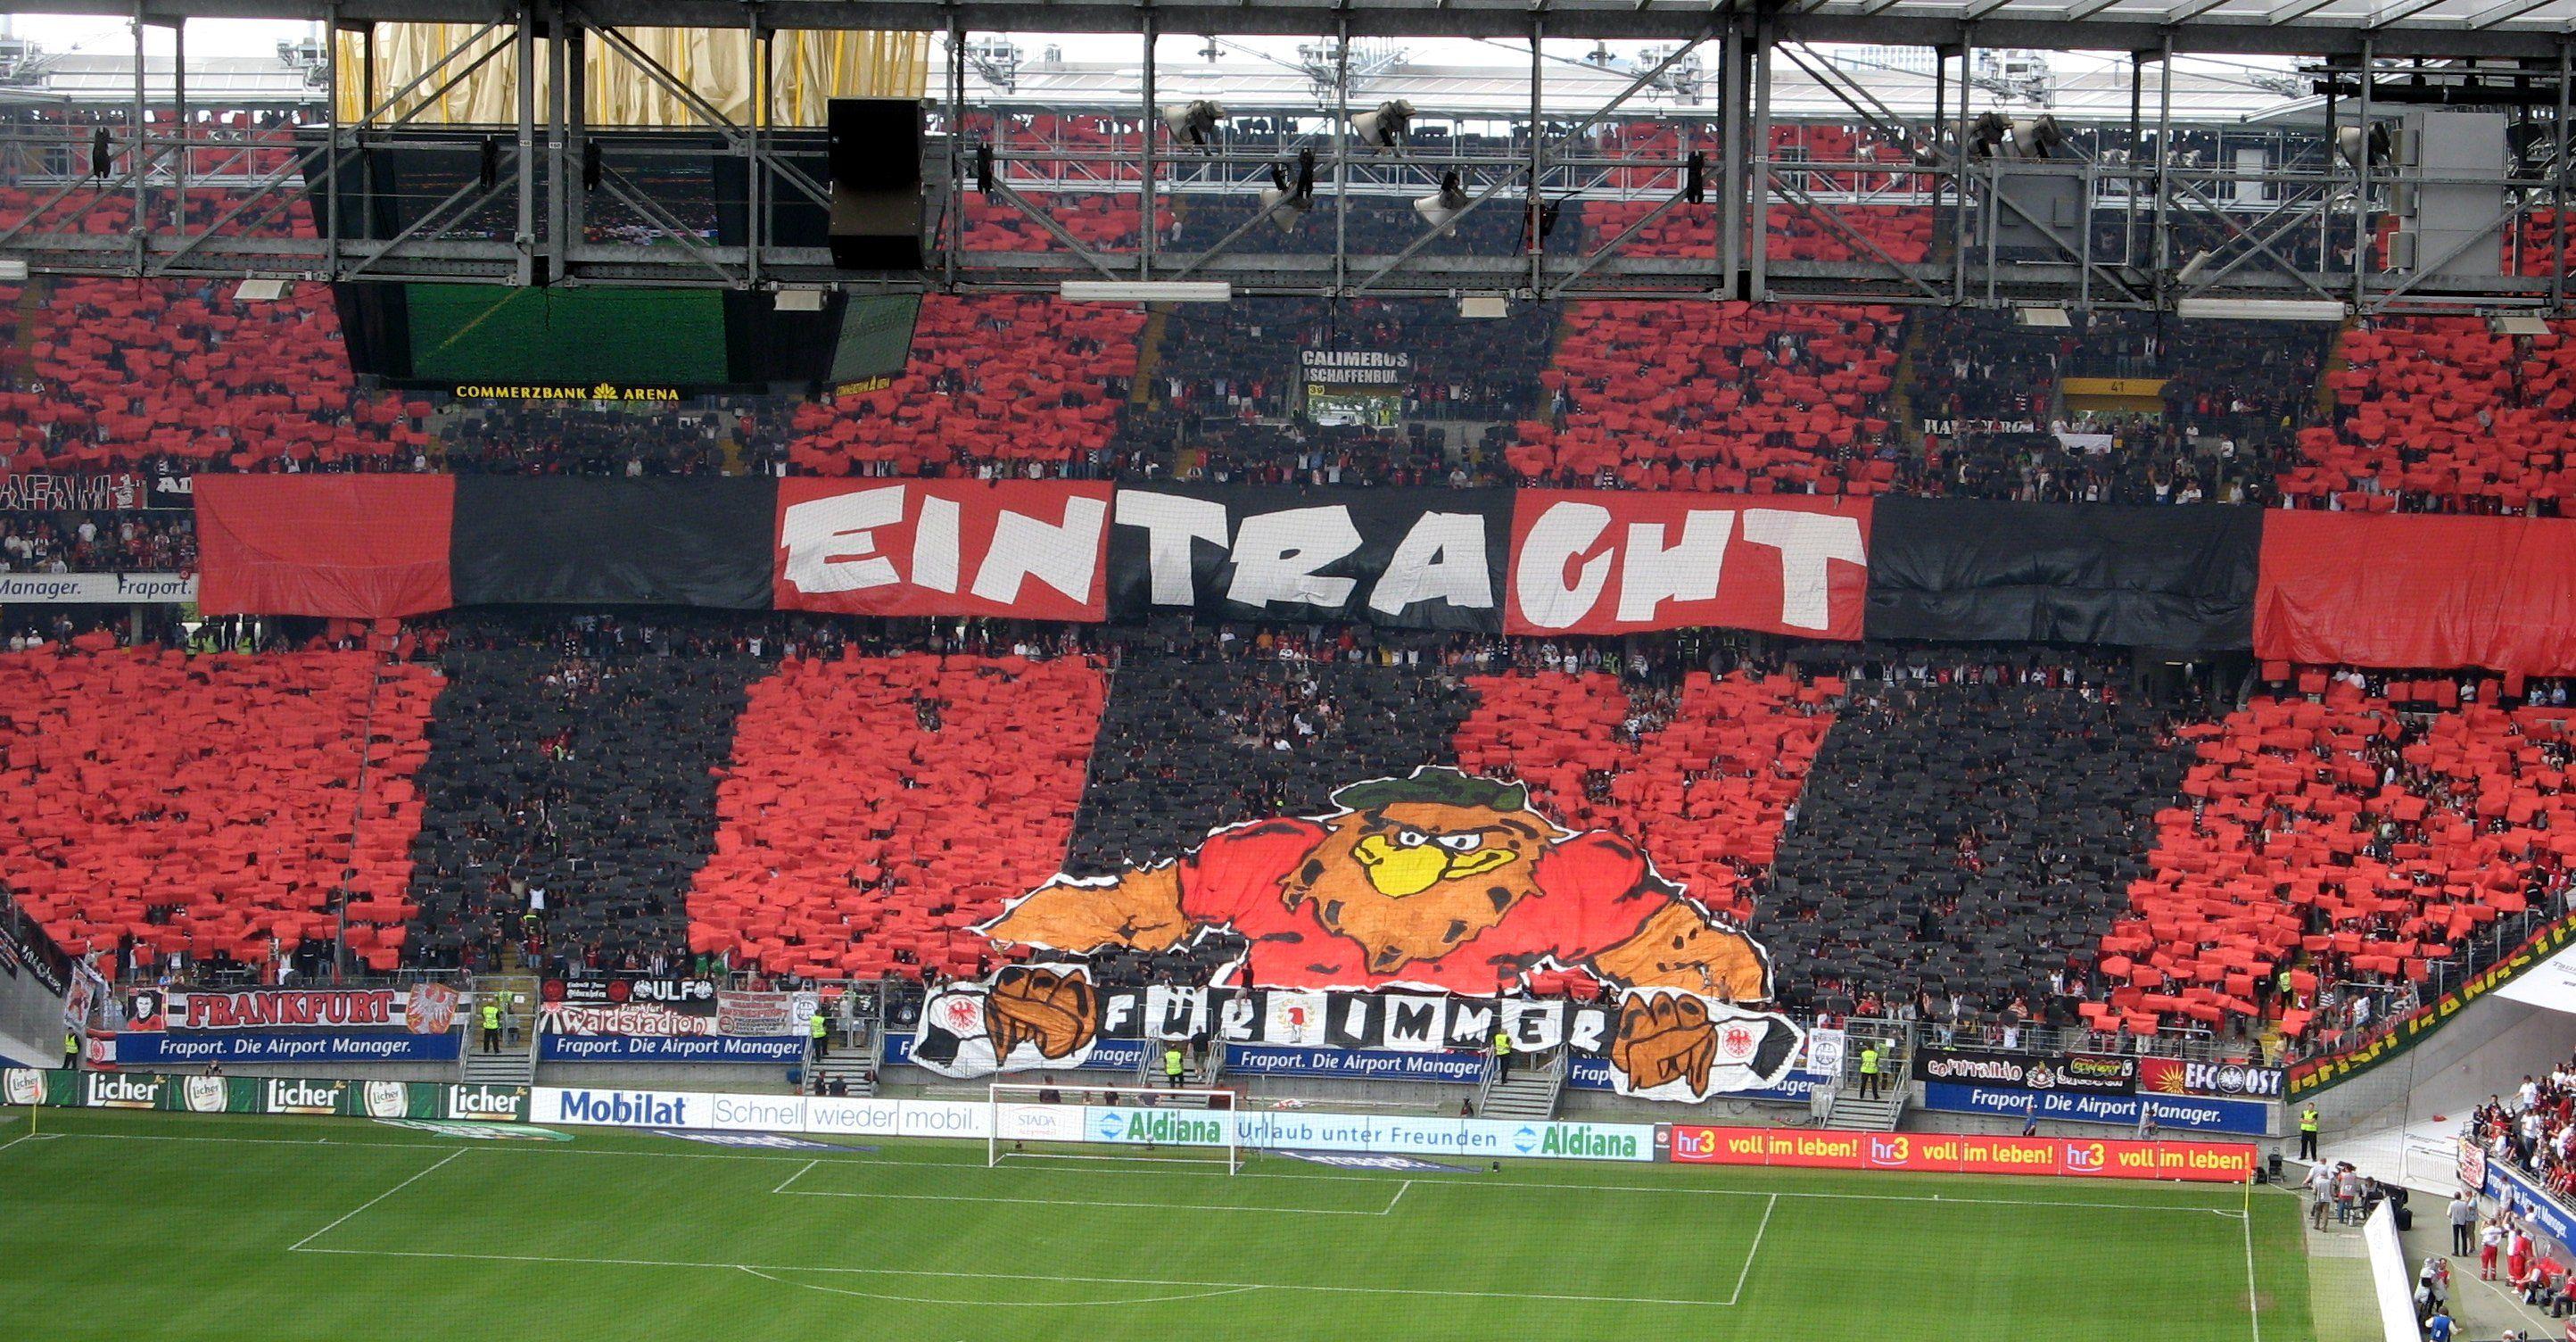 Datei Eintrachtadler Jpg Wikipedia Eintracht Frankfurt Eintracht Frankfurt